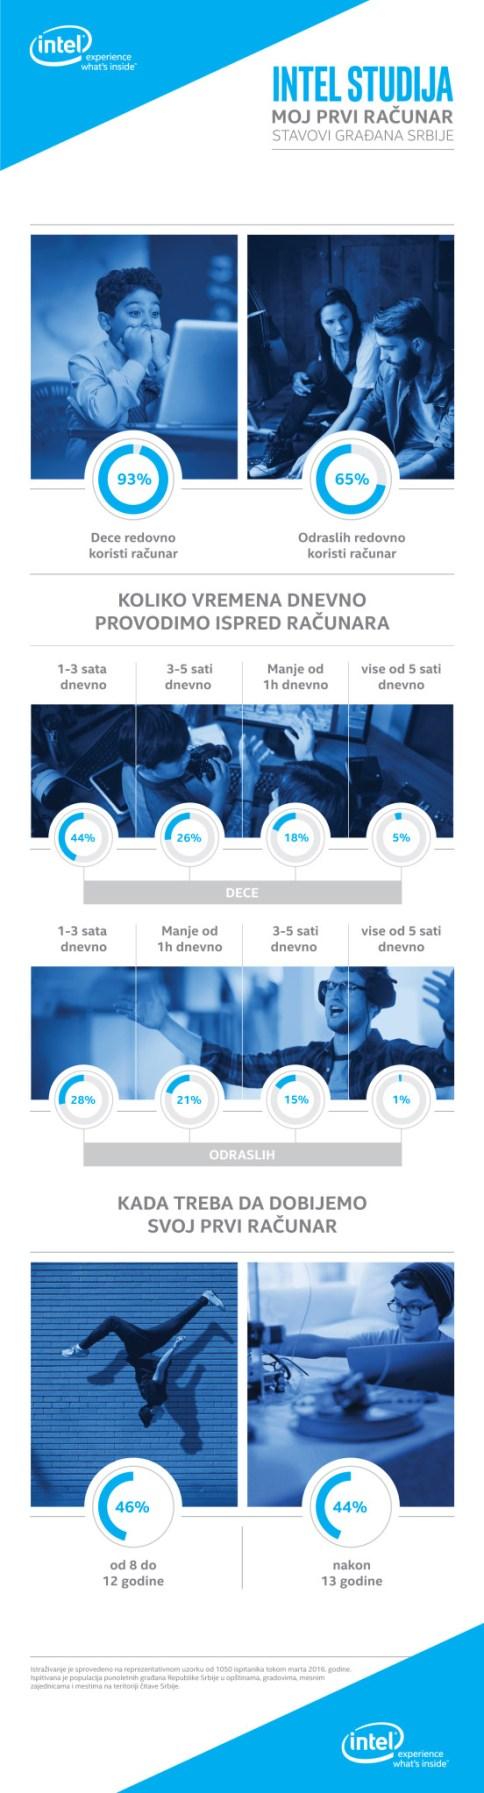 Intel_Infographic_June16